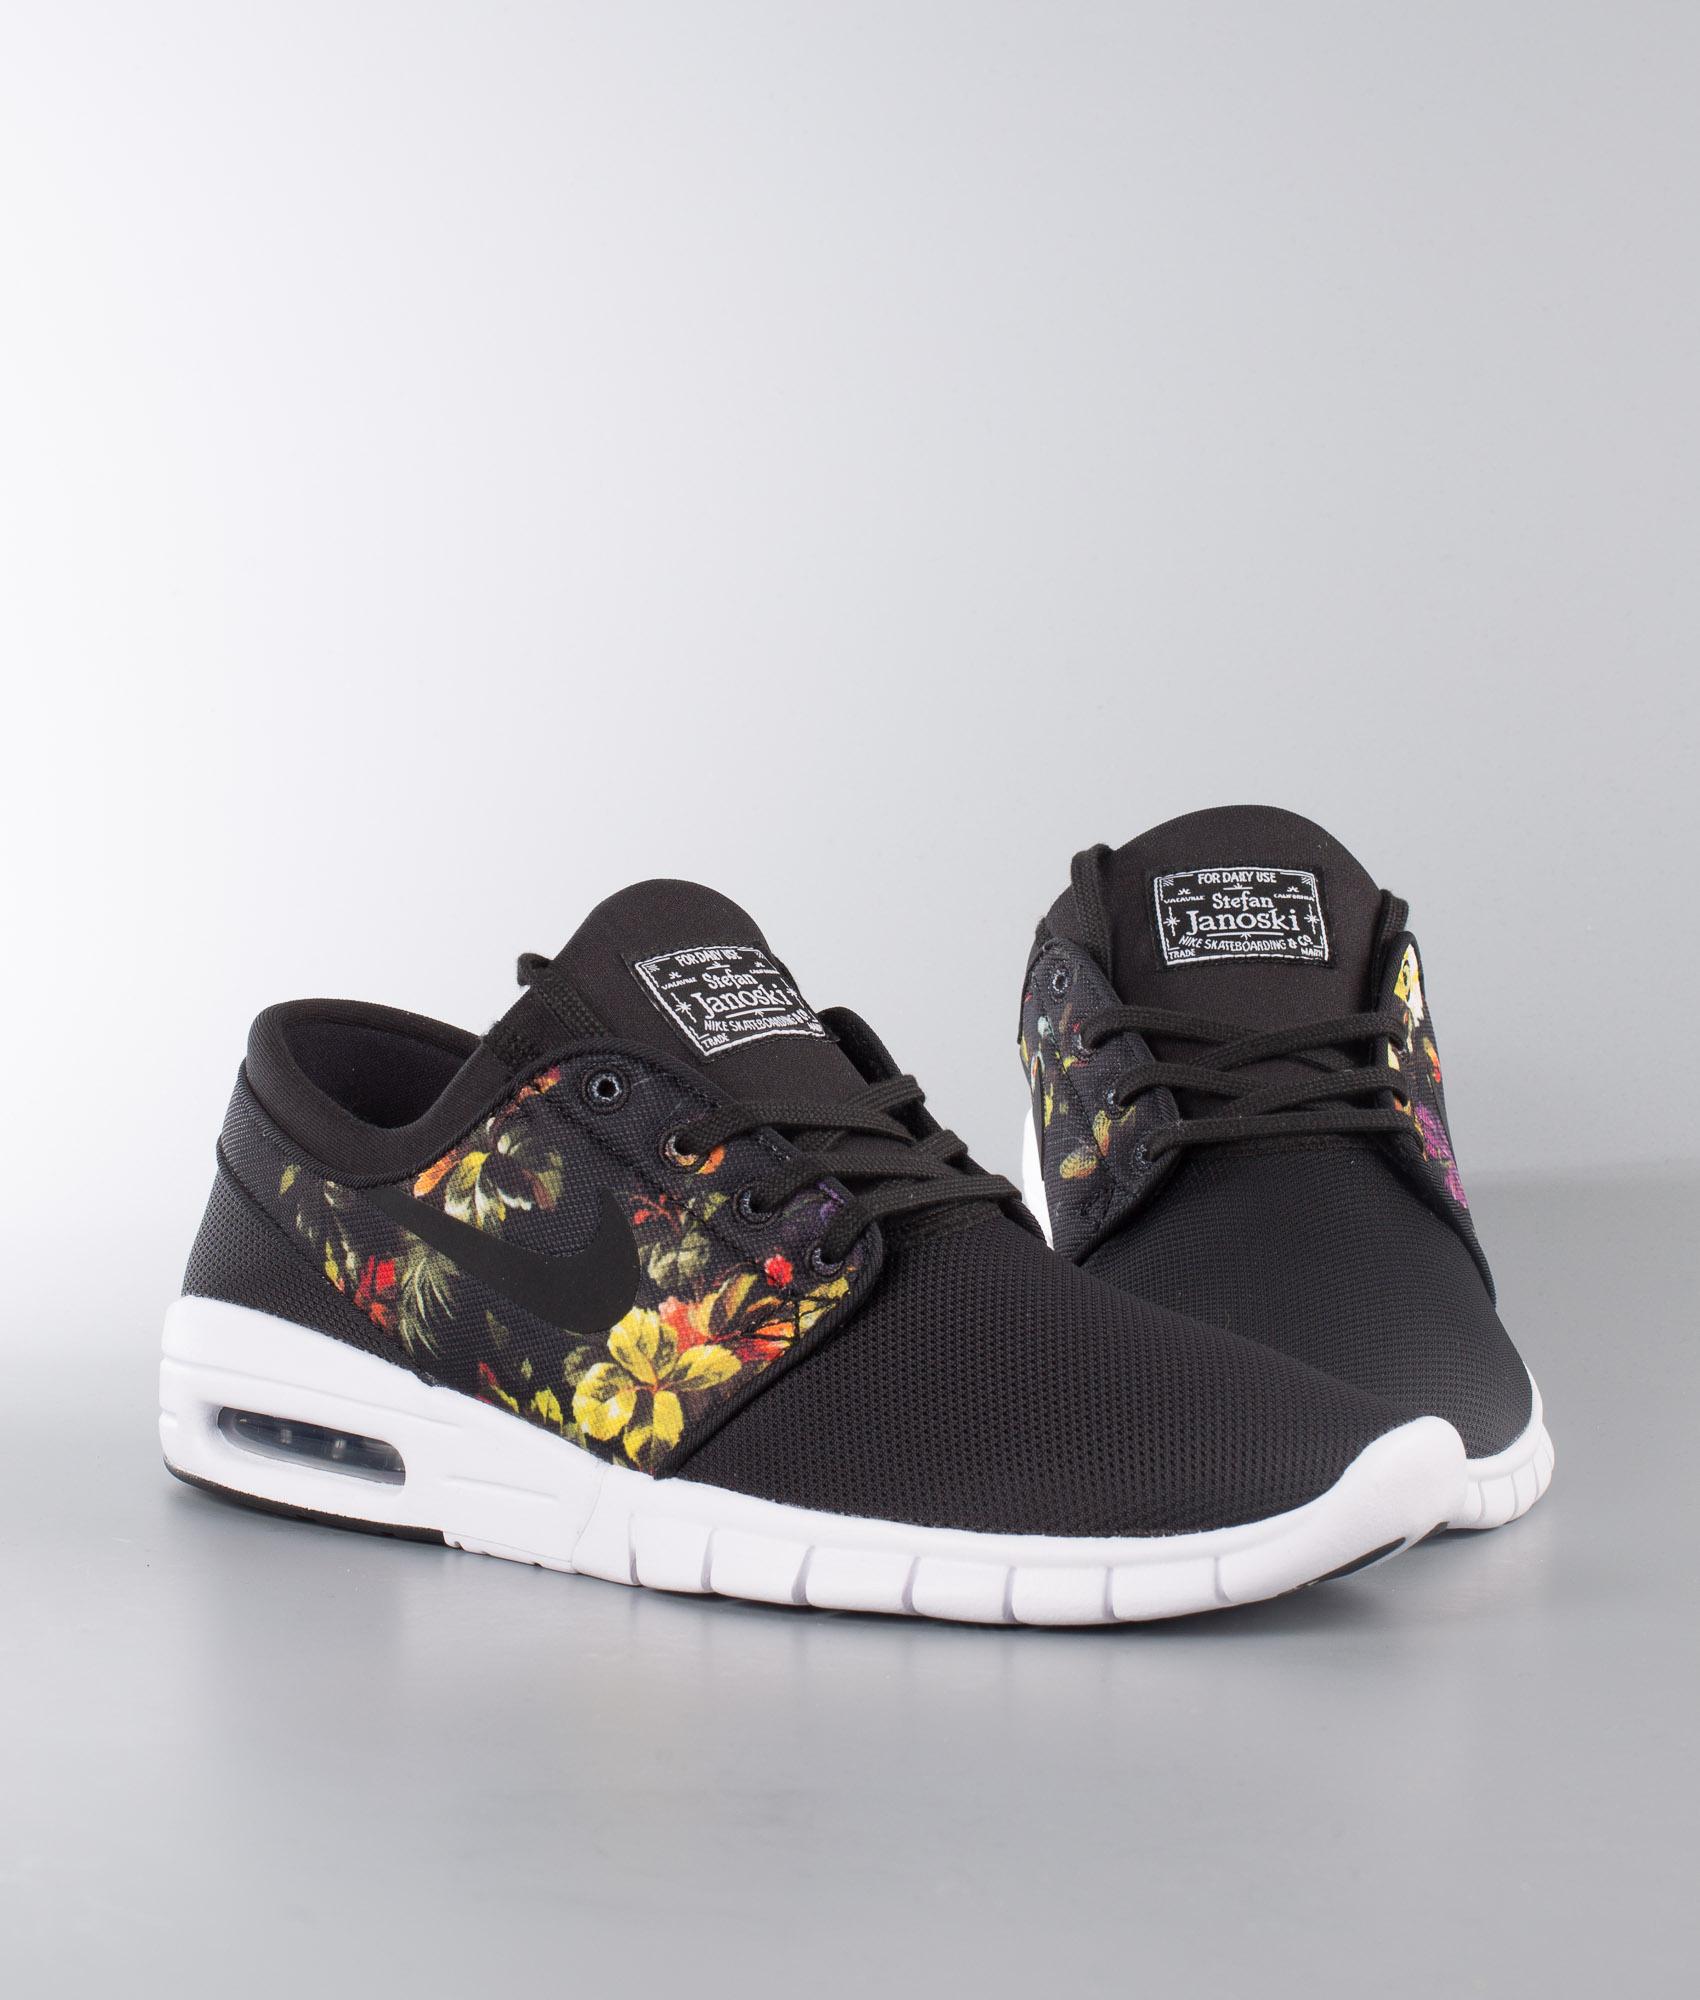 Janoski Multi Stefan Max Schuhe Color Blackblack Nike tsQCrhd